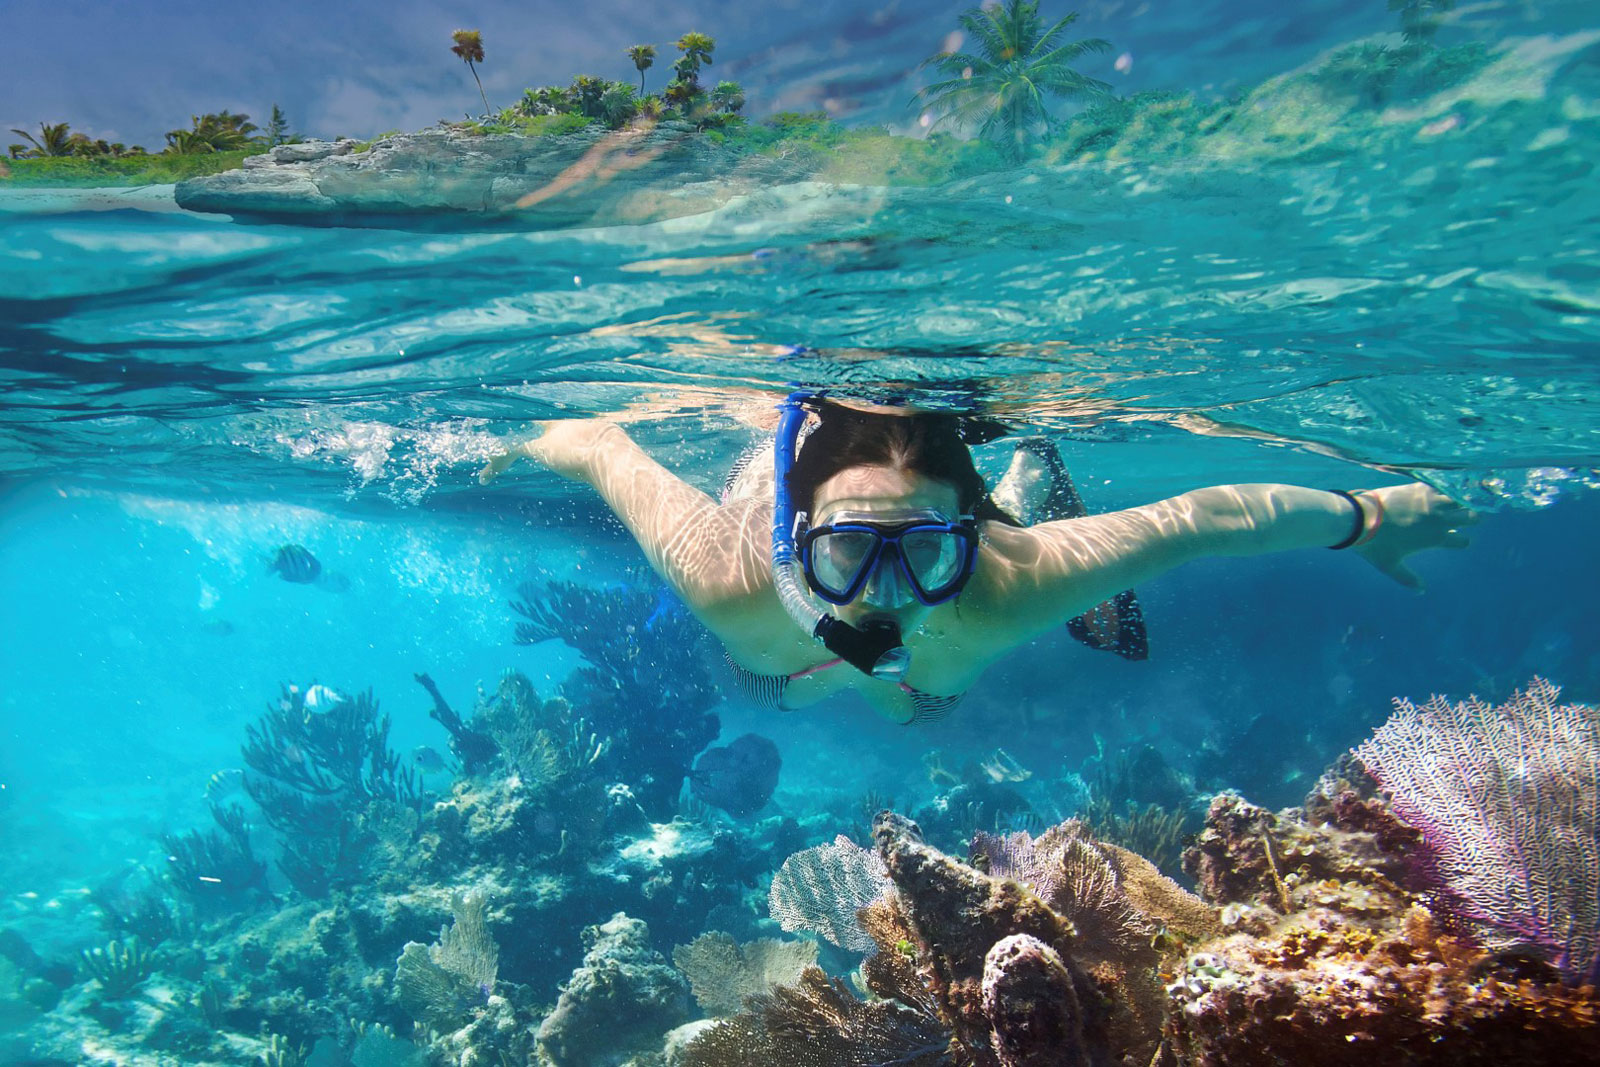 riviera-maya-snorkeling-01.jpg